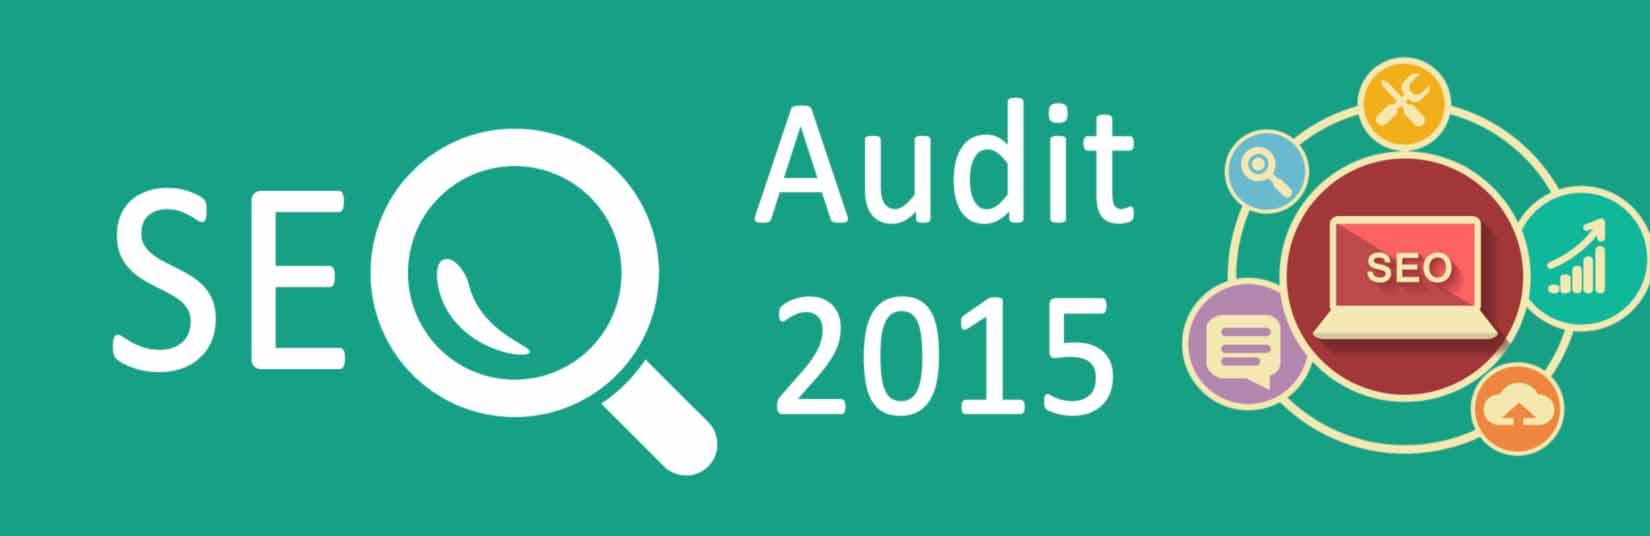 SEO Audit, SEO Audit by 2015, SEO Audit 2015